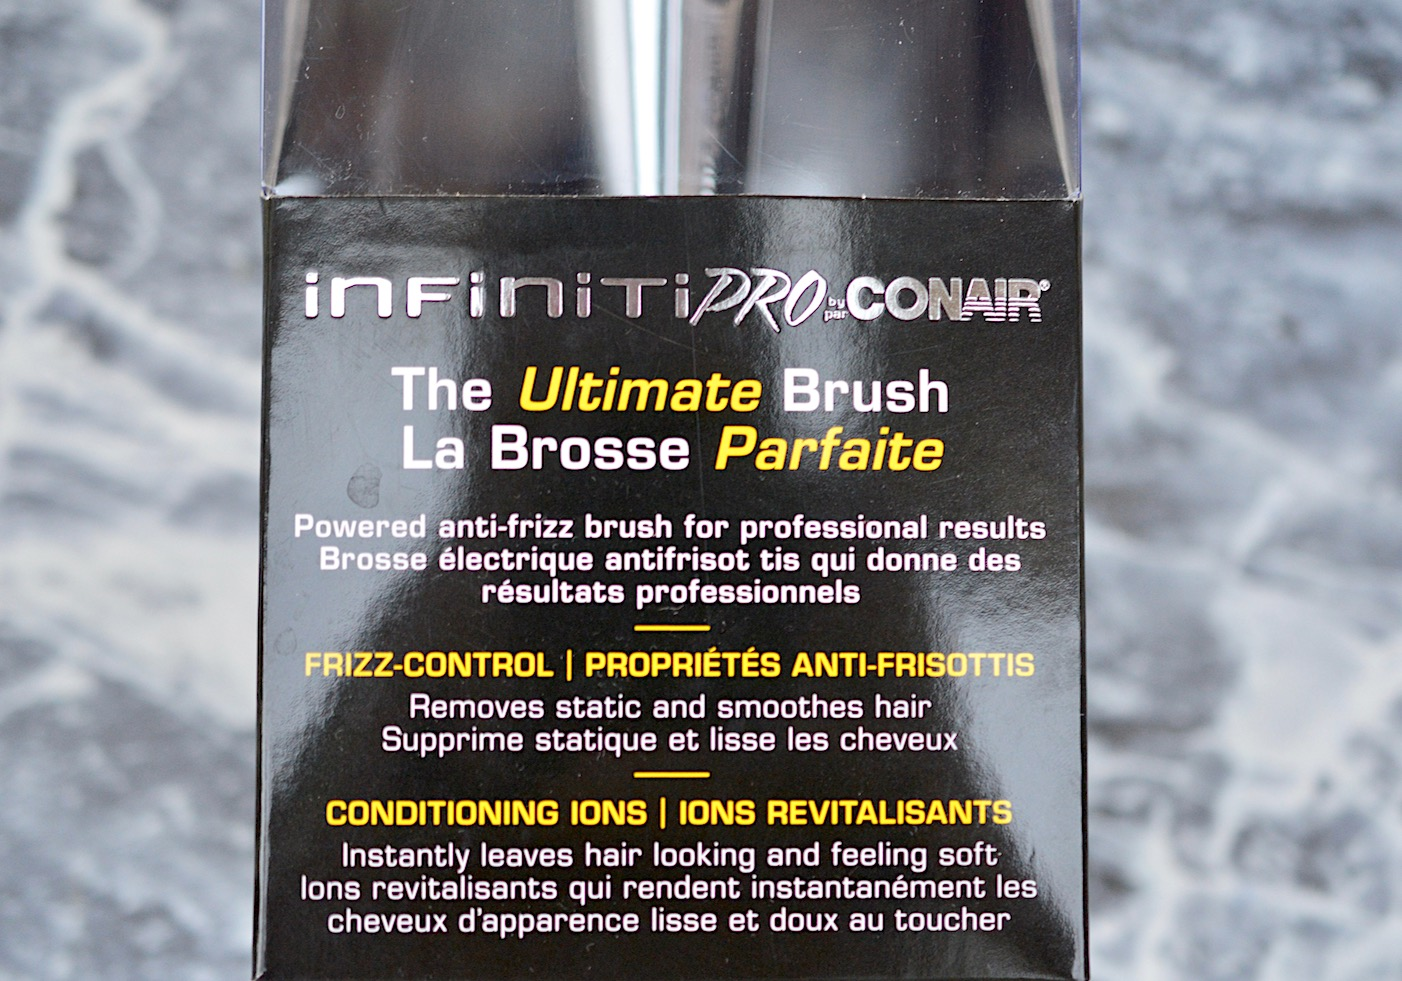 Conair Electric Brush